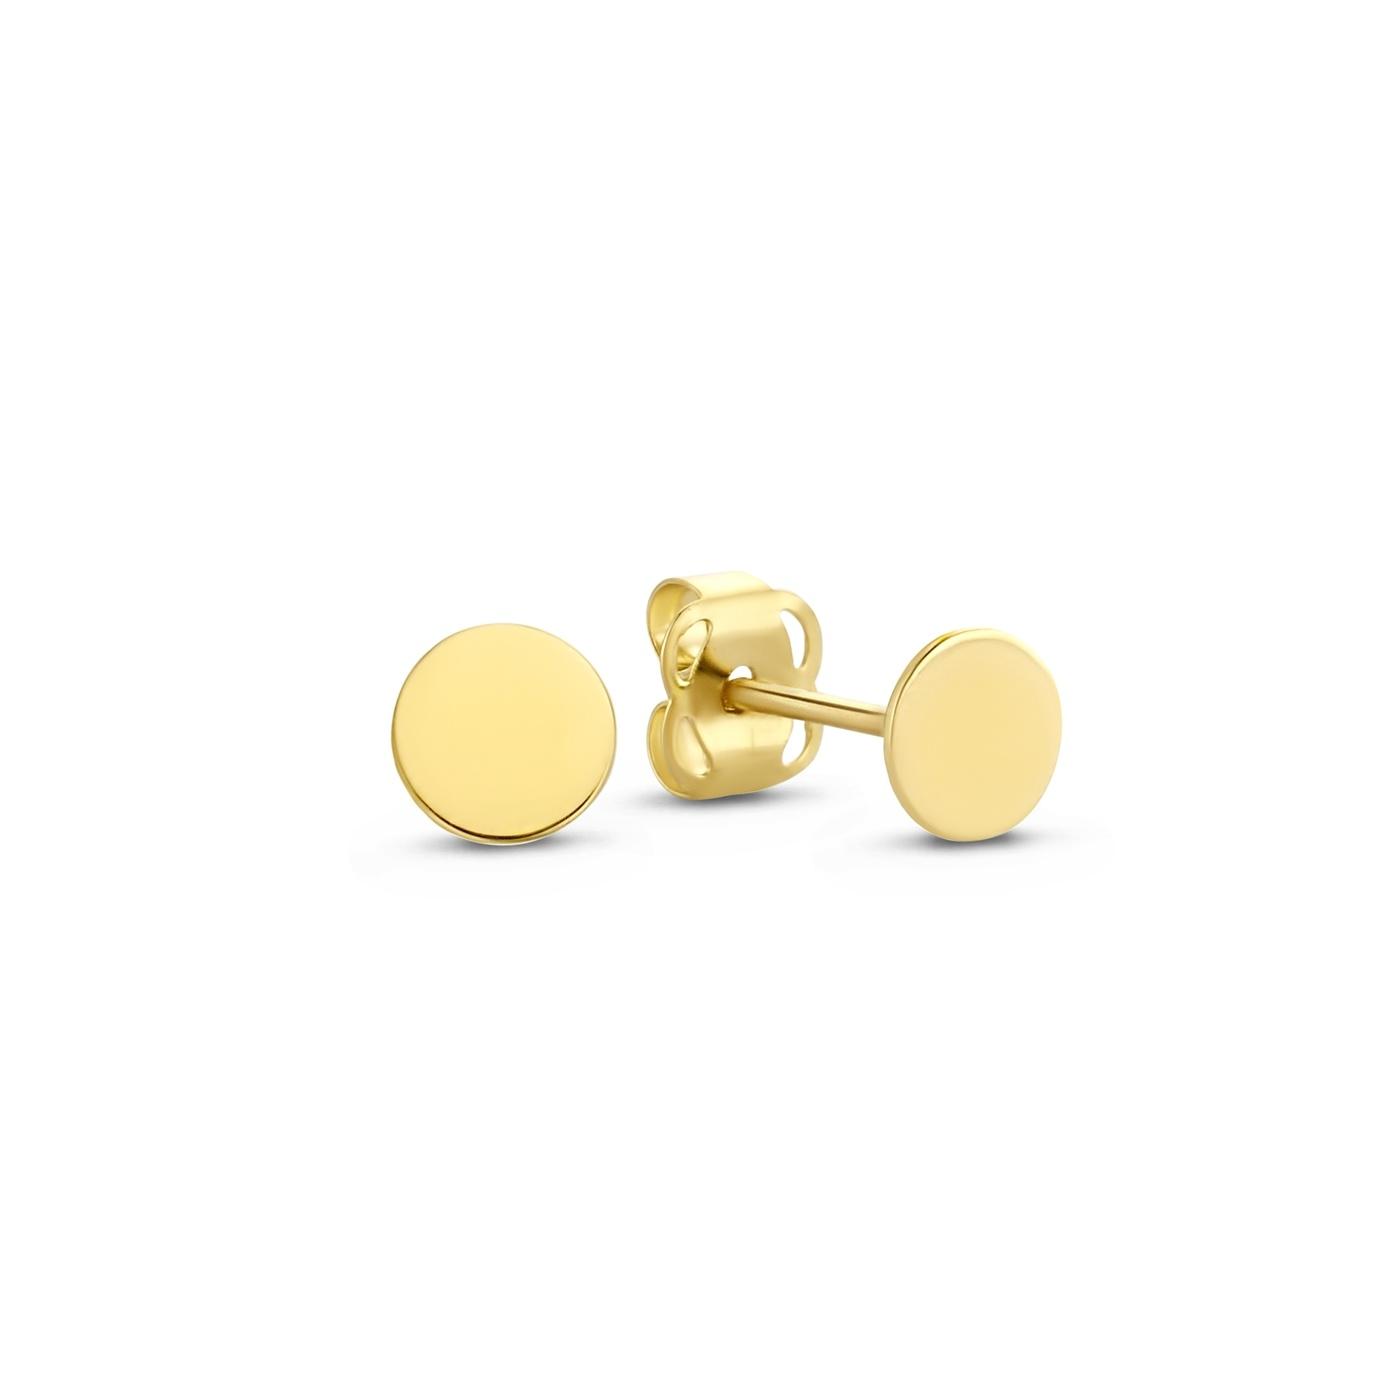 Isabel Bernard Le Marais Jeanne 14 karat gold ear studs with coin